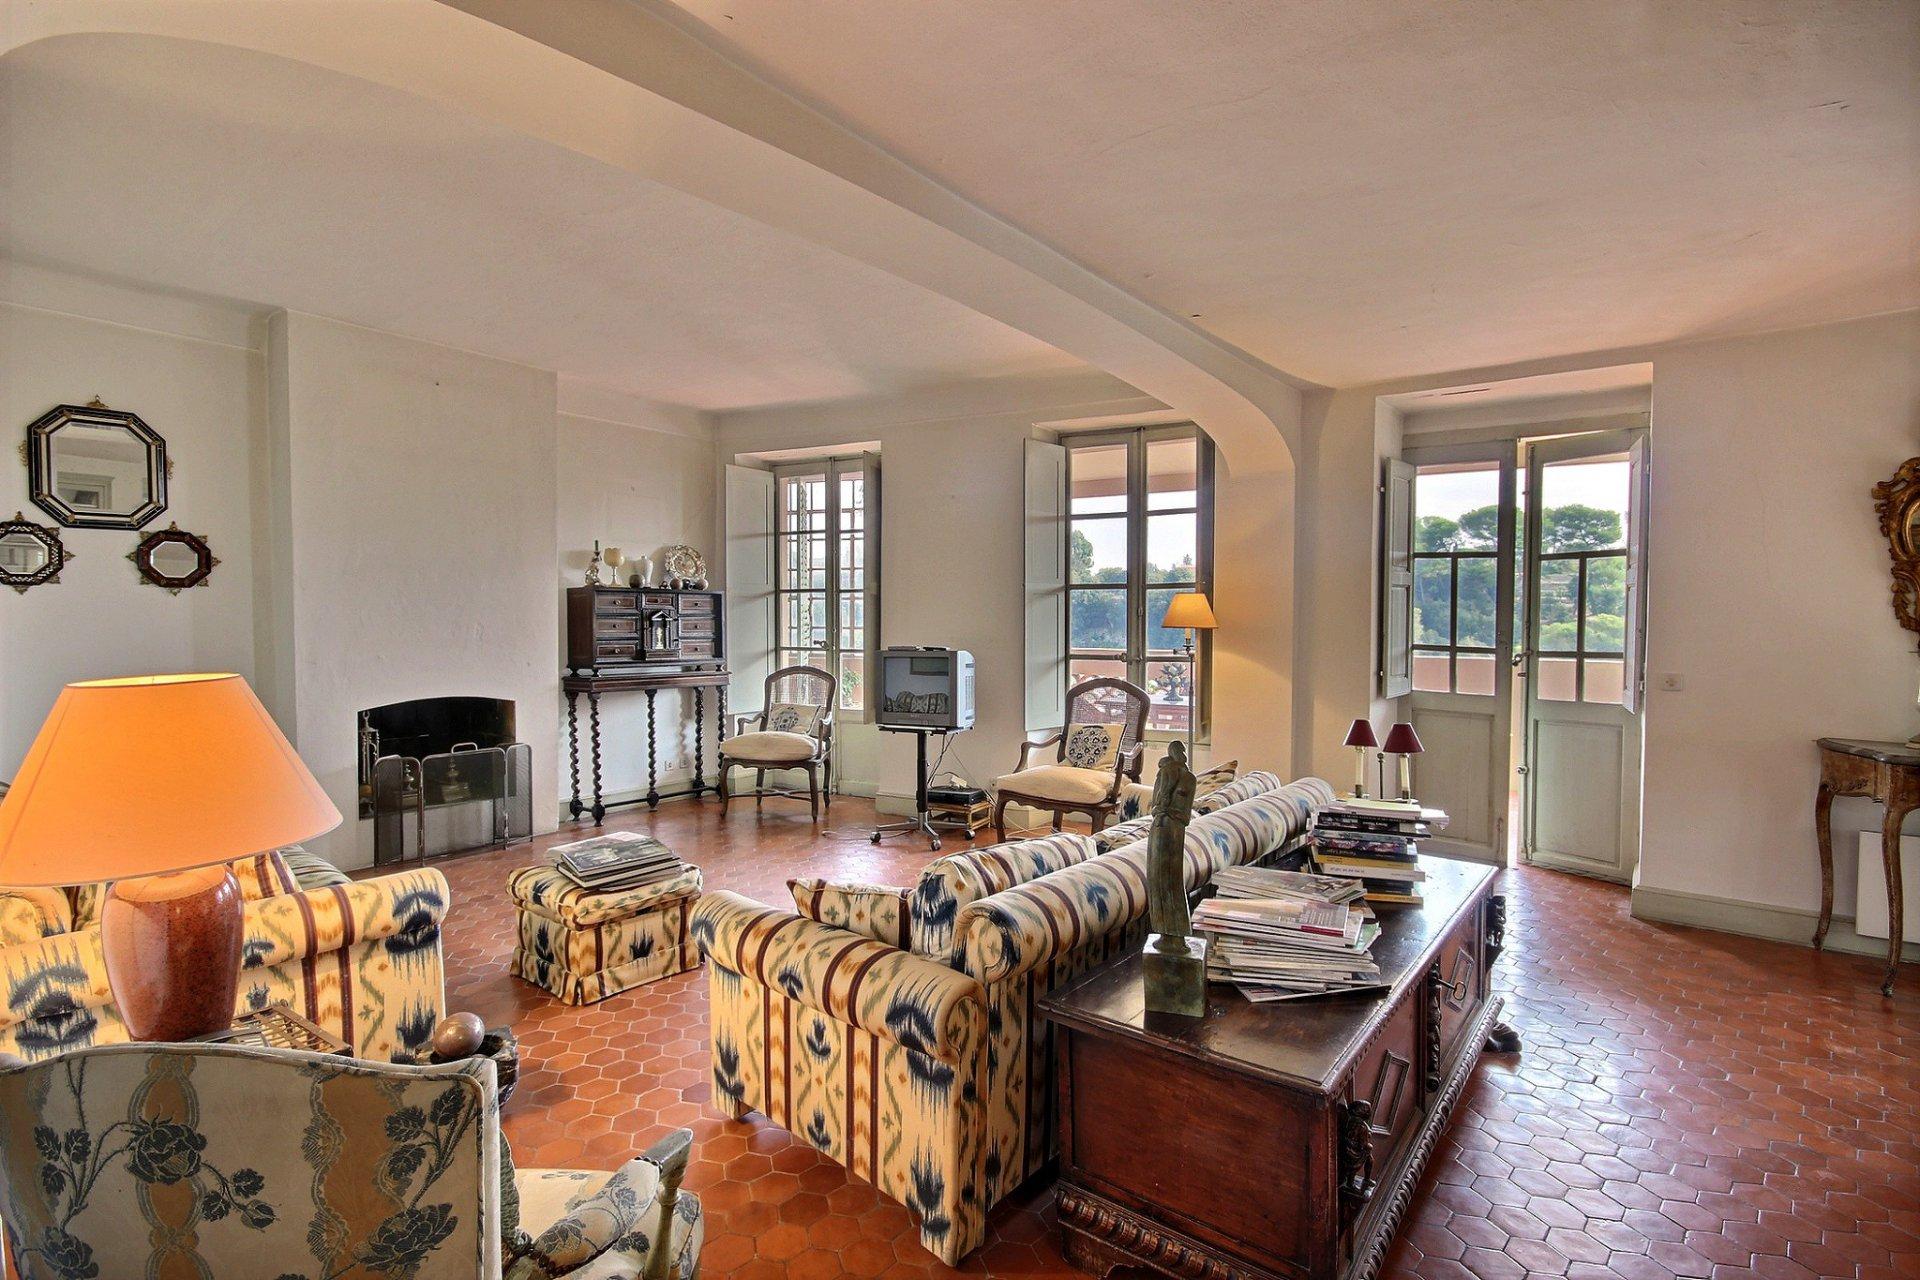 Maison bourgeoise avec 6 chambres